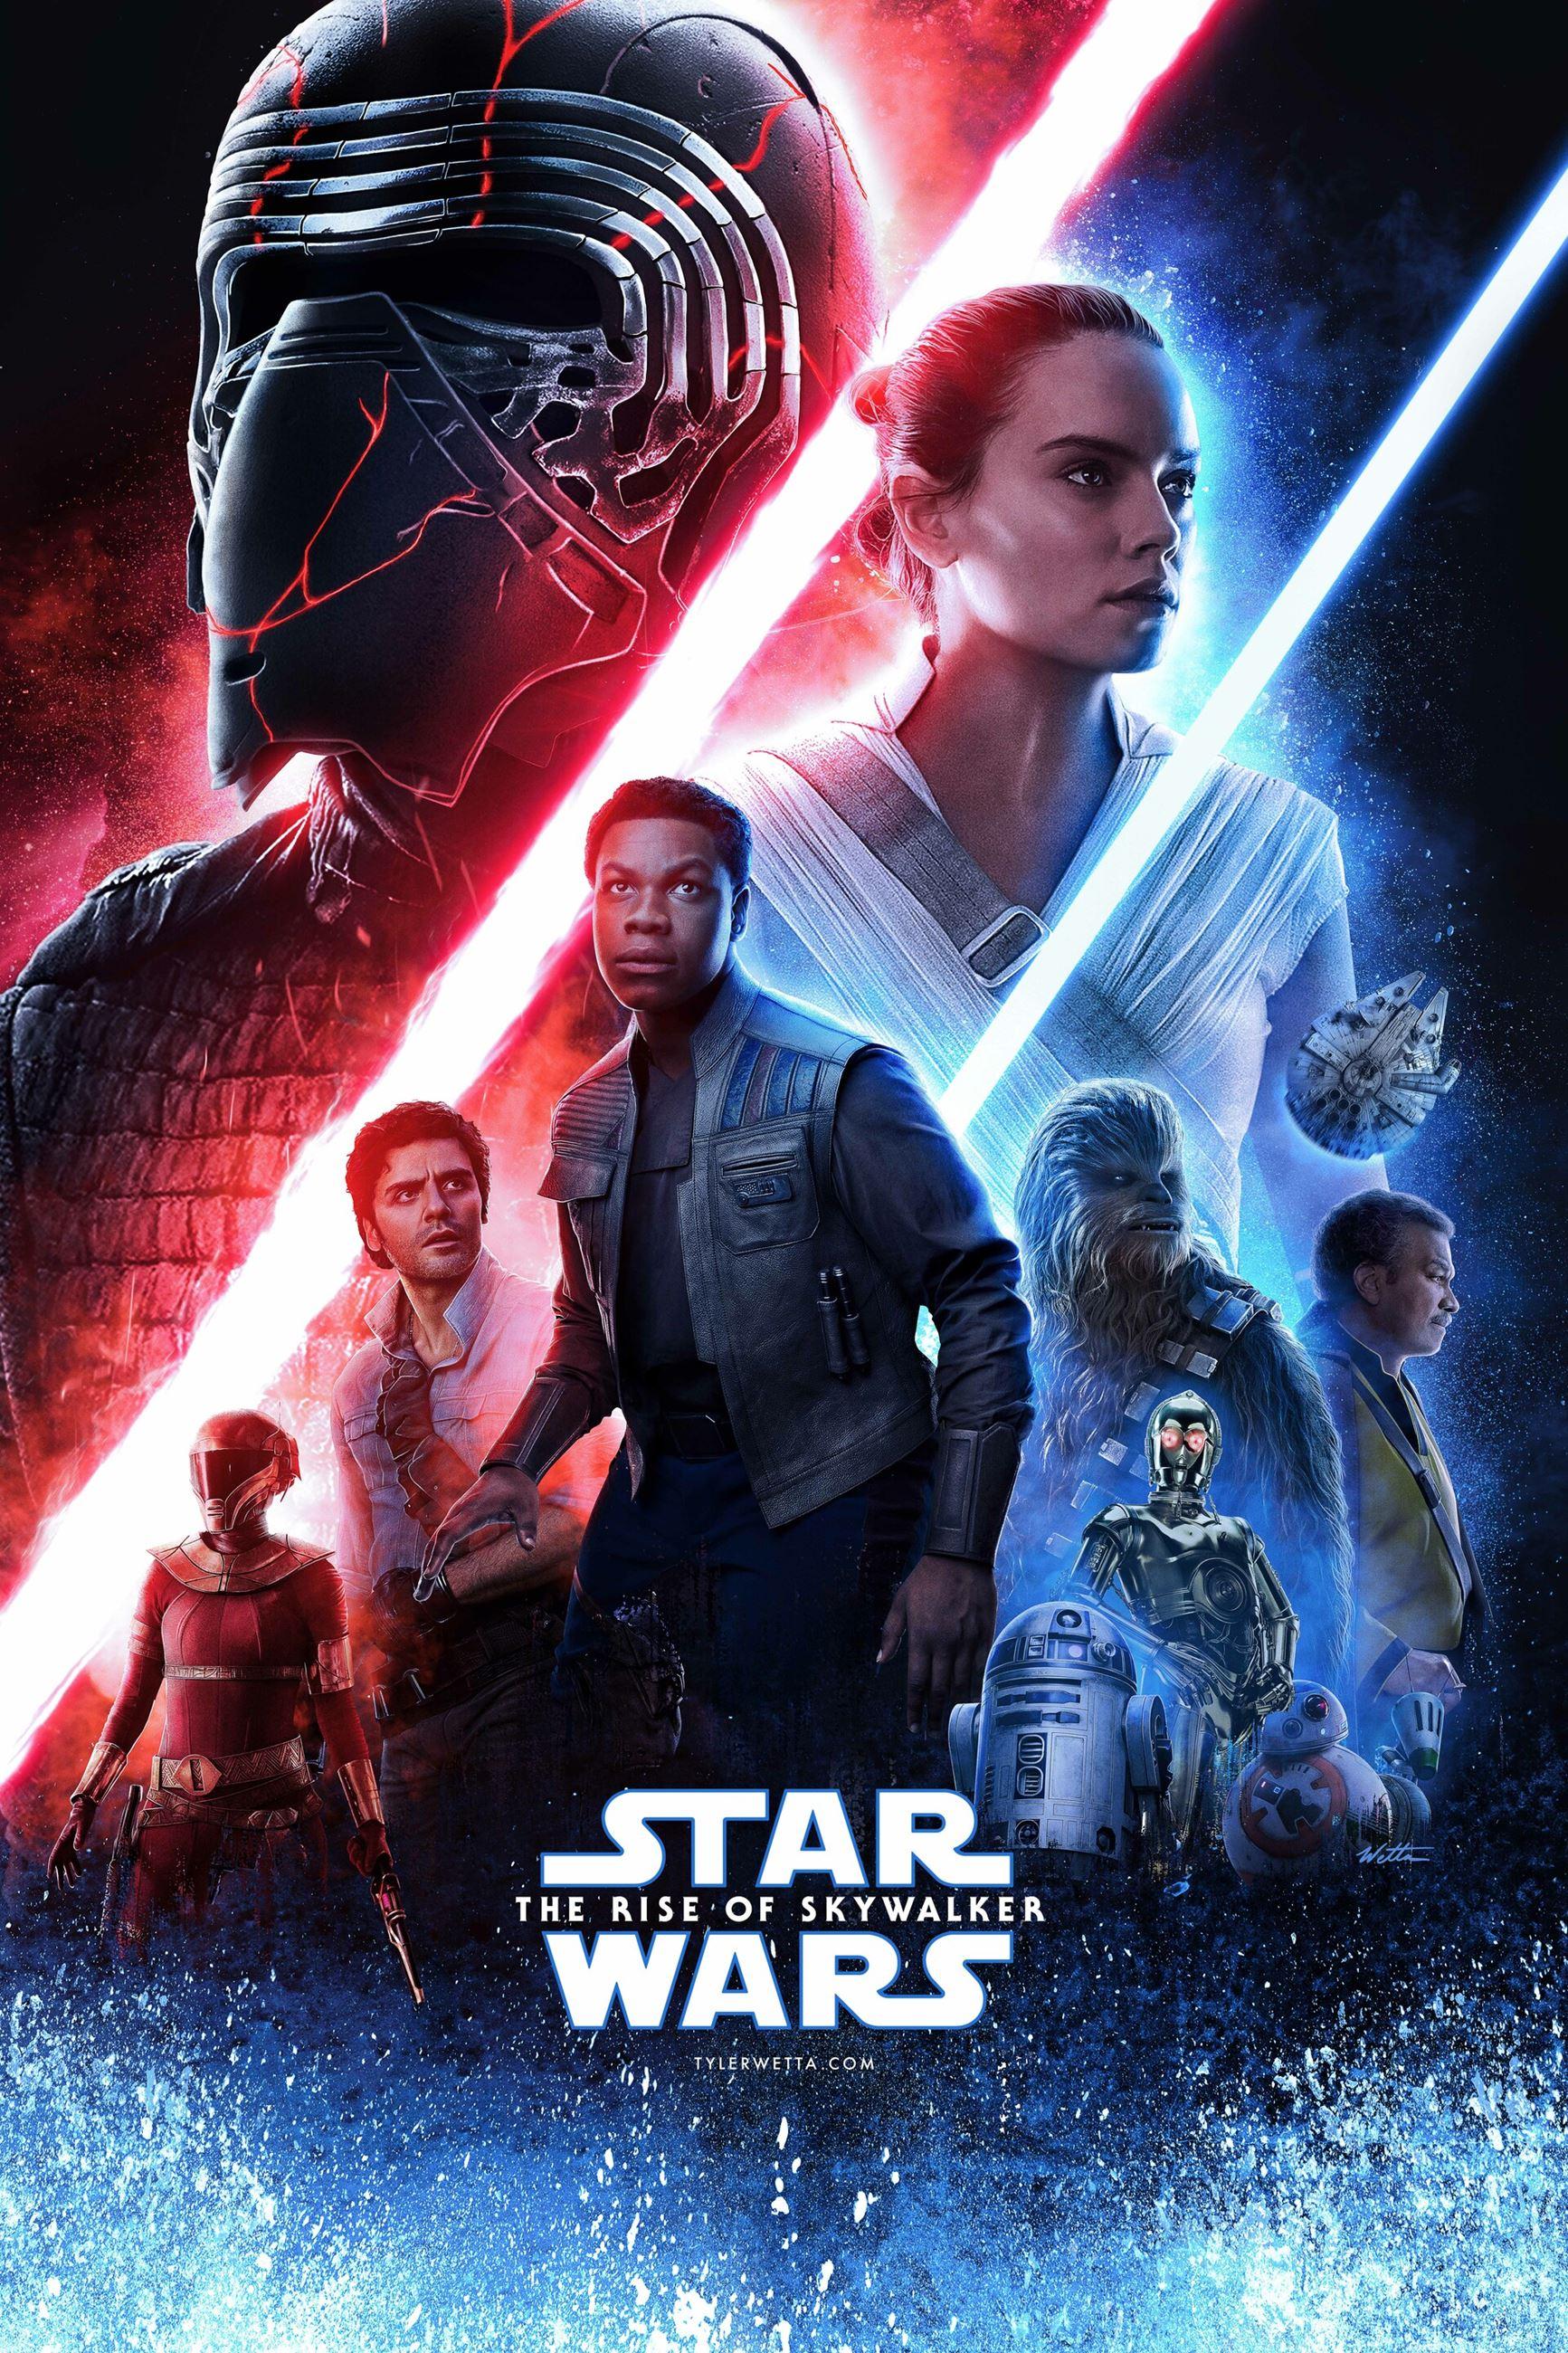 Star Wars Rise of Skywalker Movie Poster